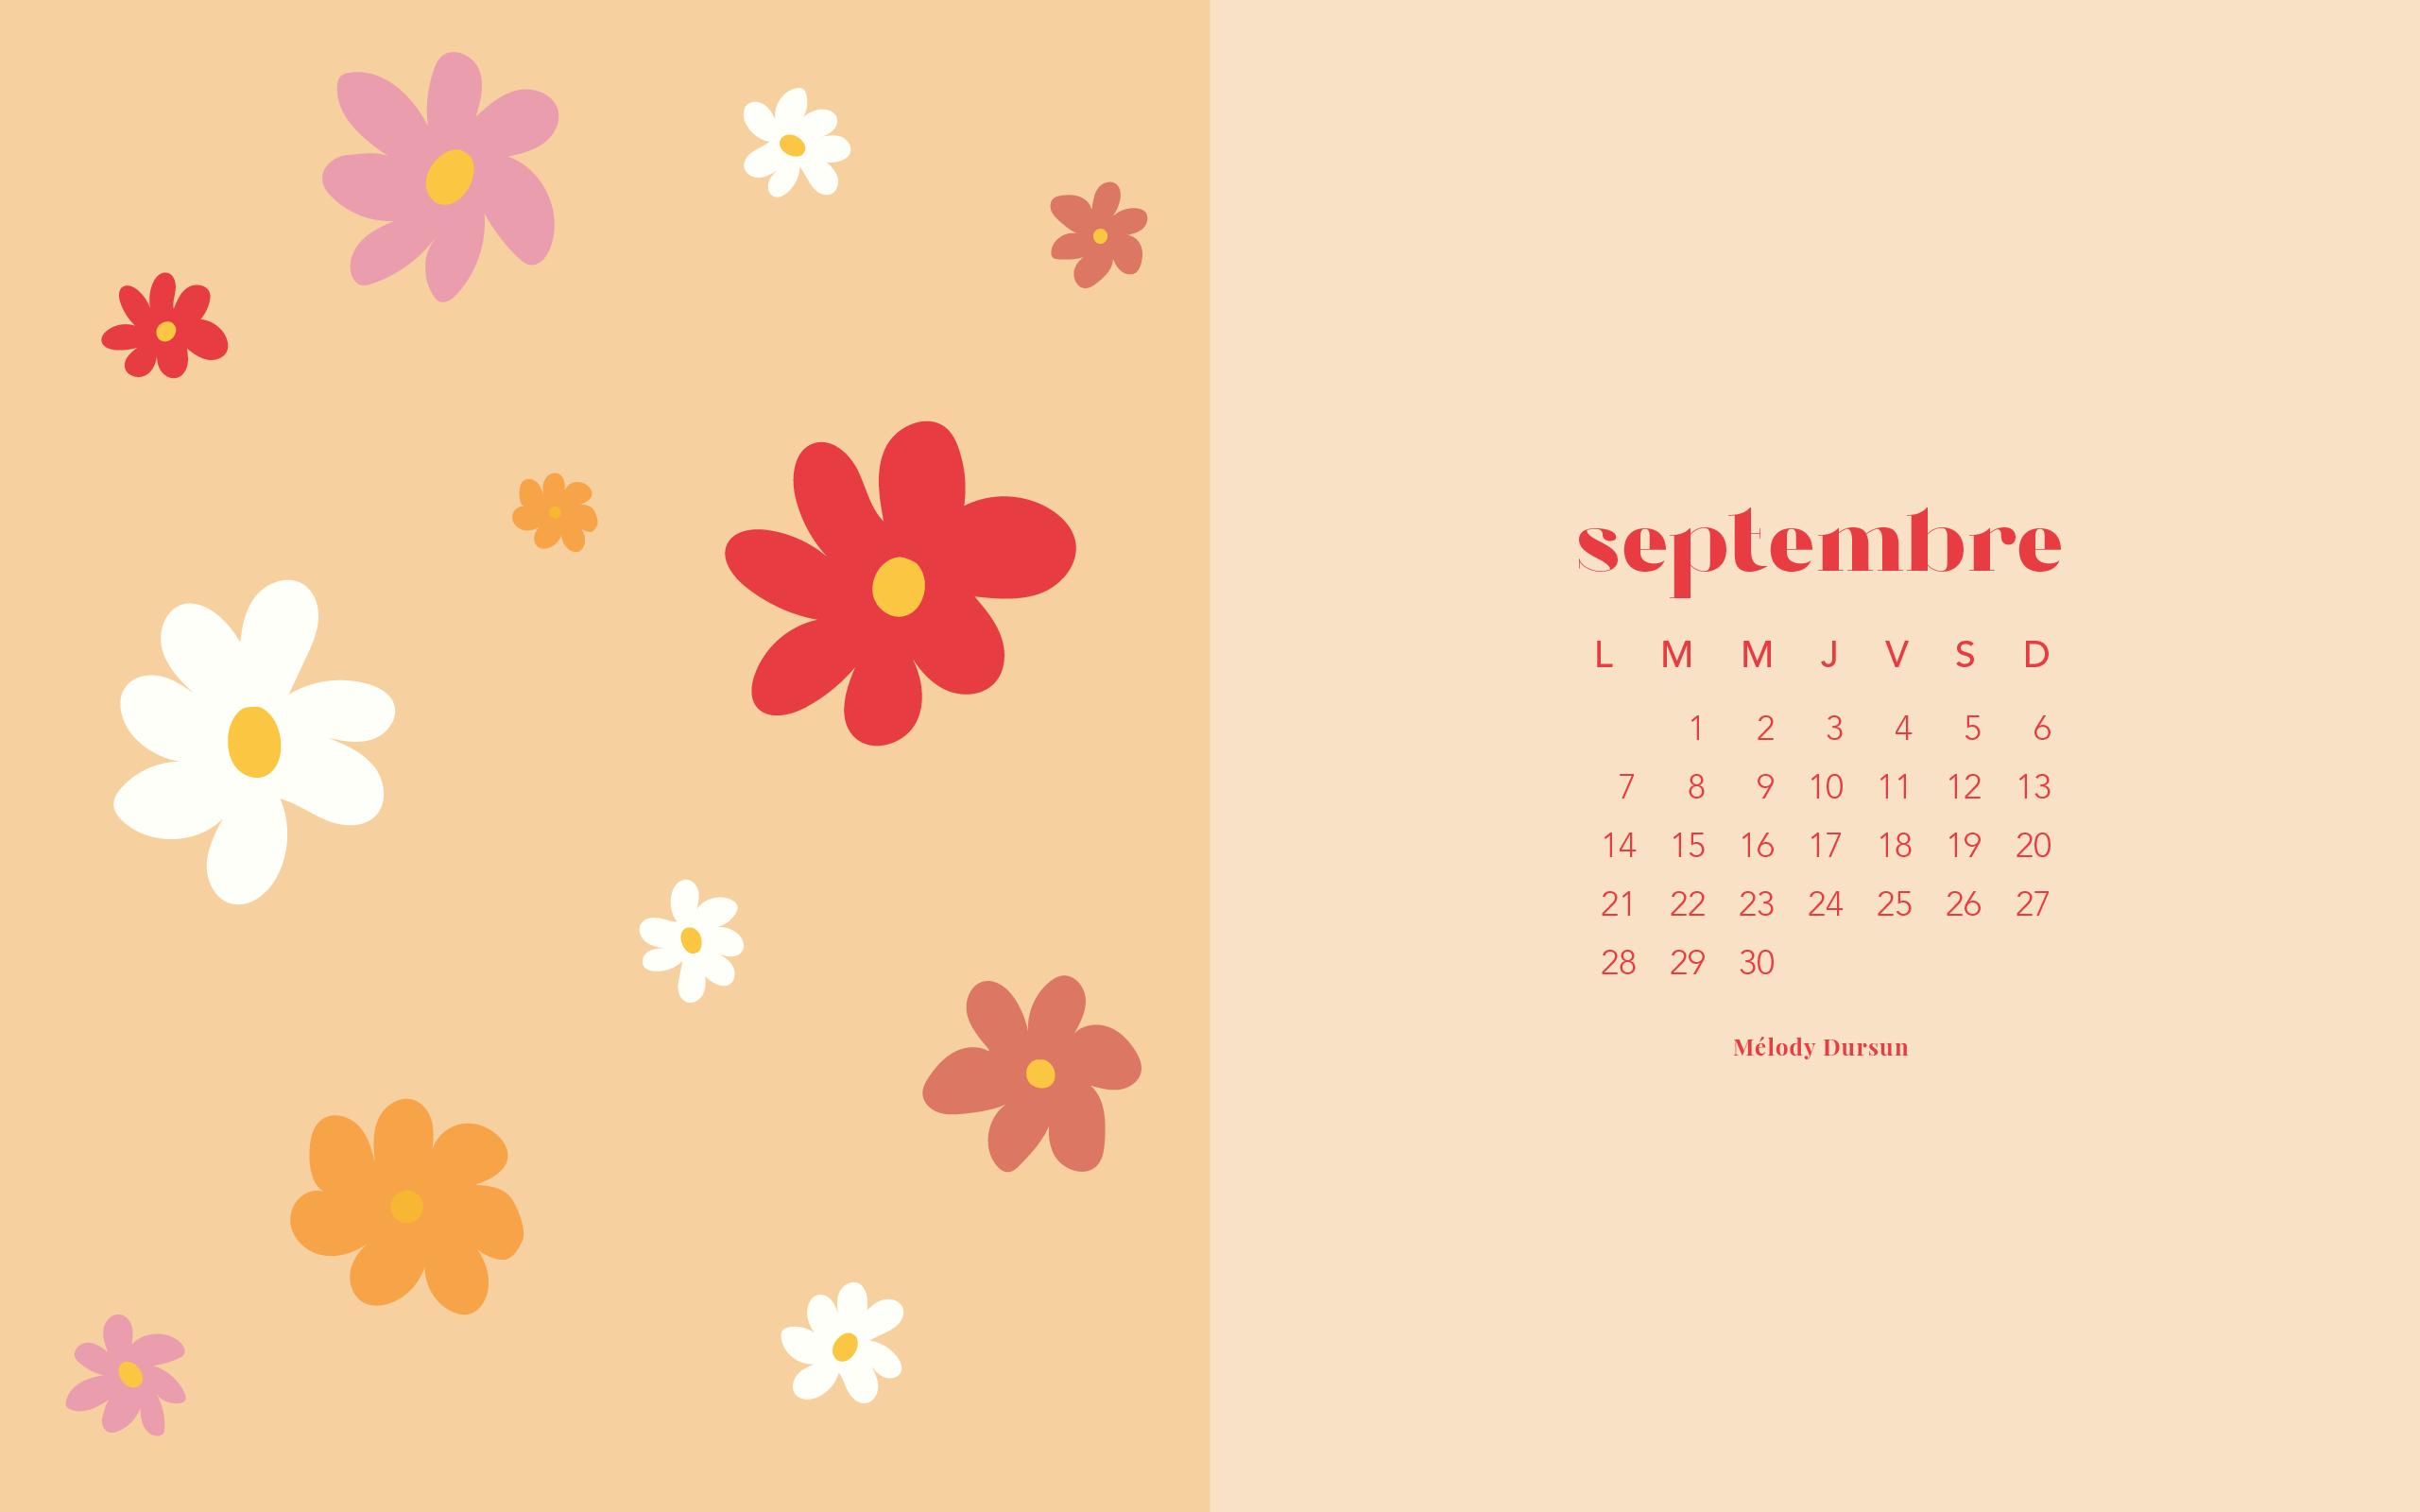 Calendrier & fonds d'écran – Septembre 2020